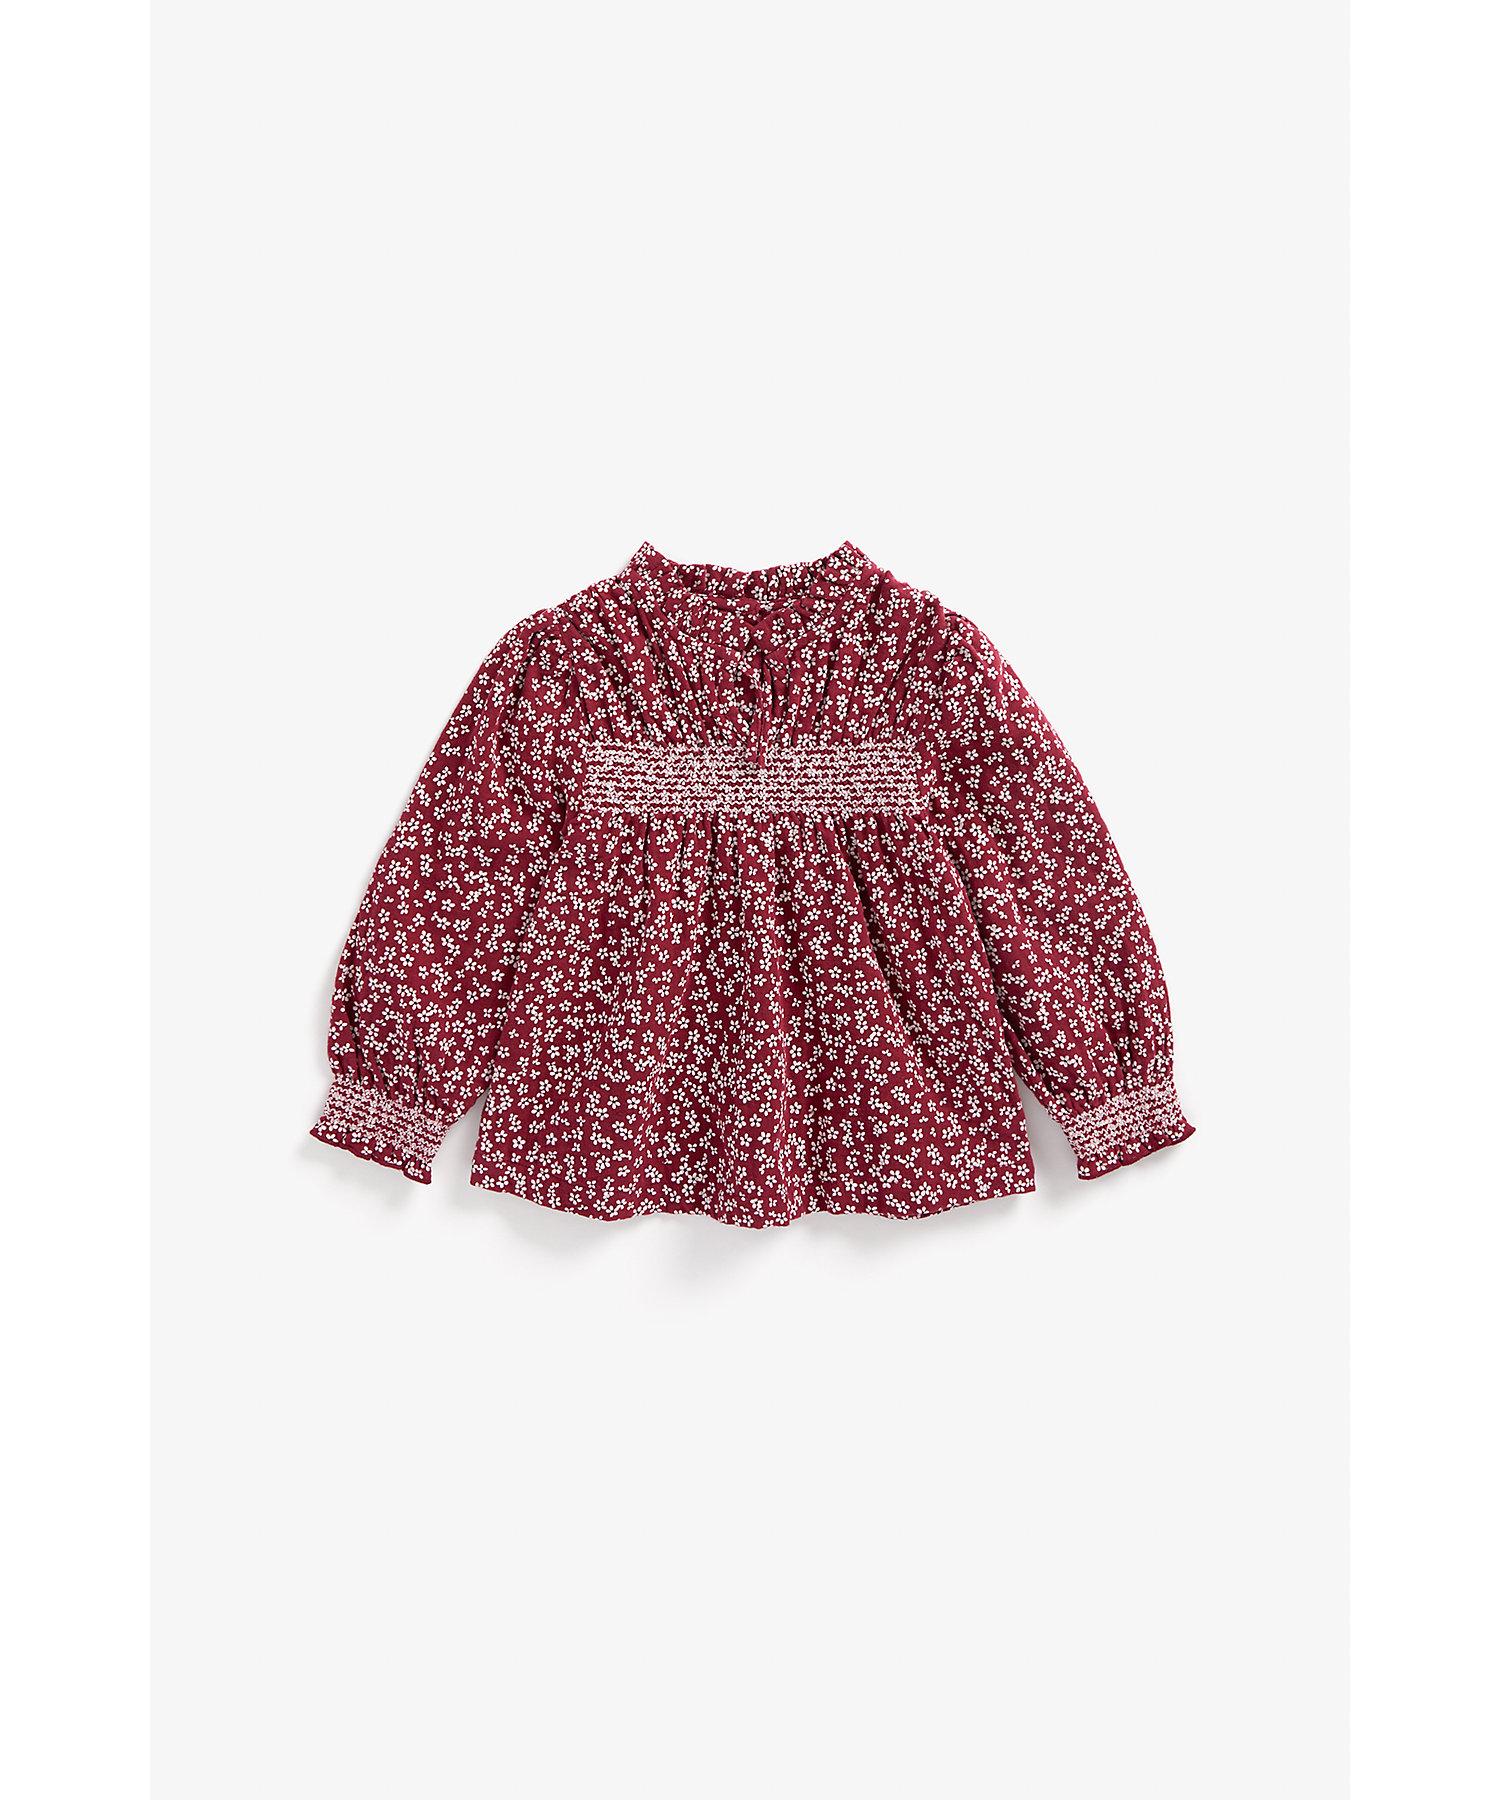 Mothercare | Girls Full Sleeves Smocked Top Floral Print - Burgundy